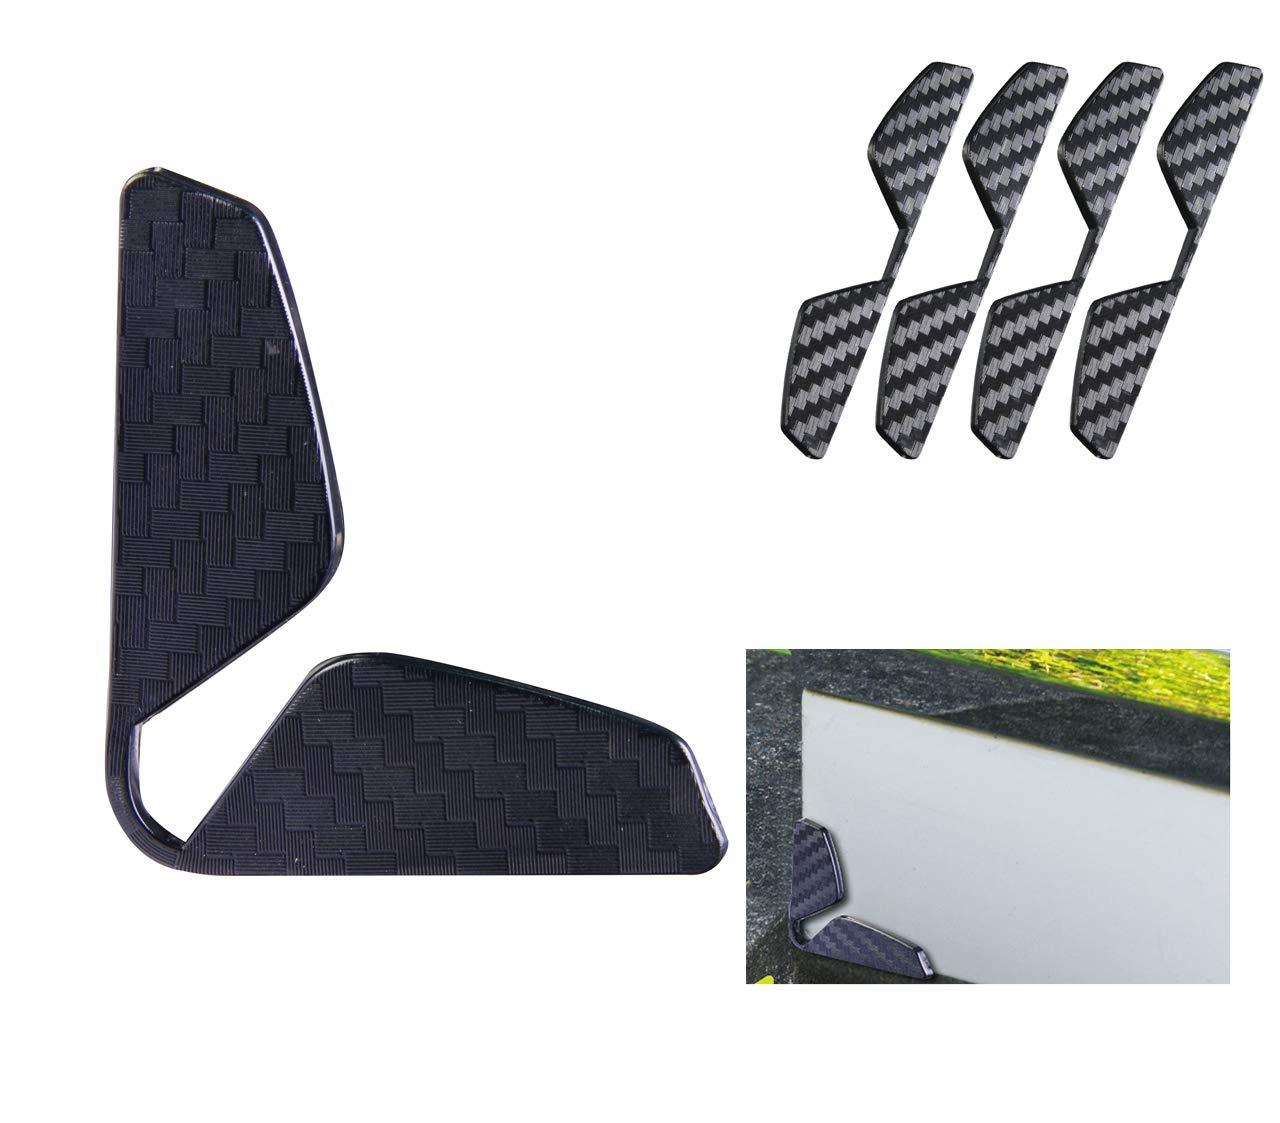 Hypersonic Car Door Protector Black Car Door Edge Guards Black Trim Auto Carbon Fiber Anti-Scratch Protector Side Corner Bumpers Protection Sticker 4PCS black